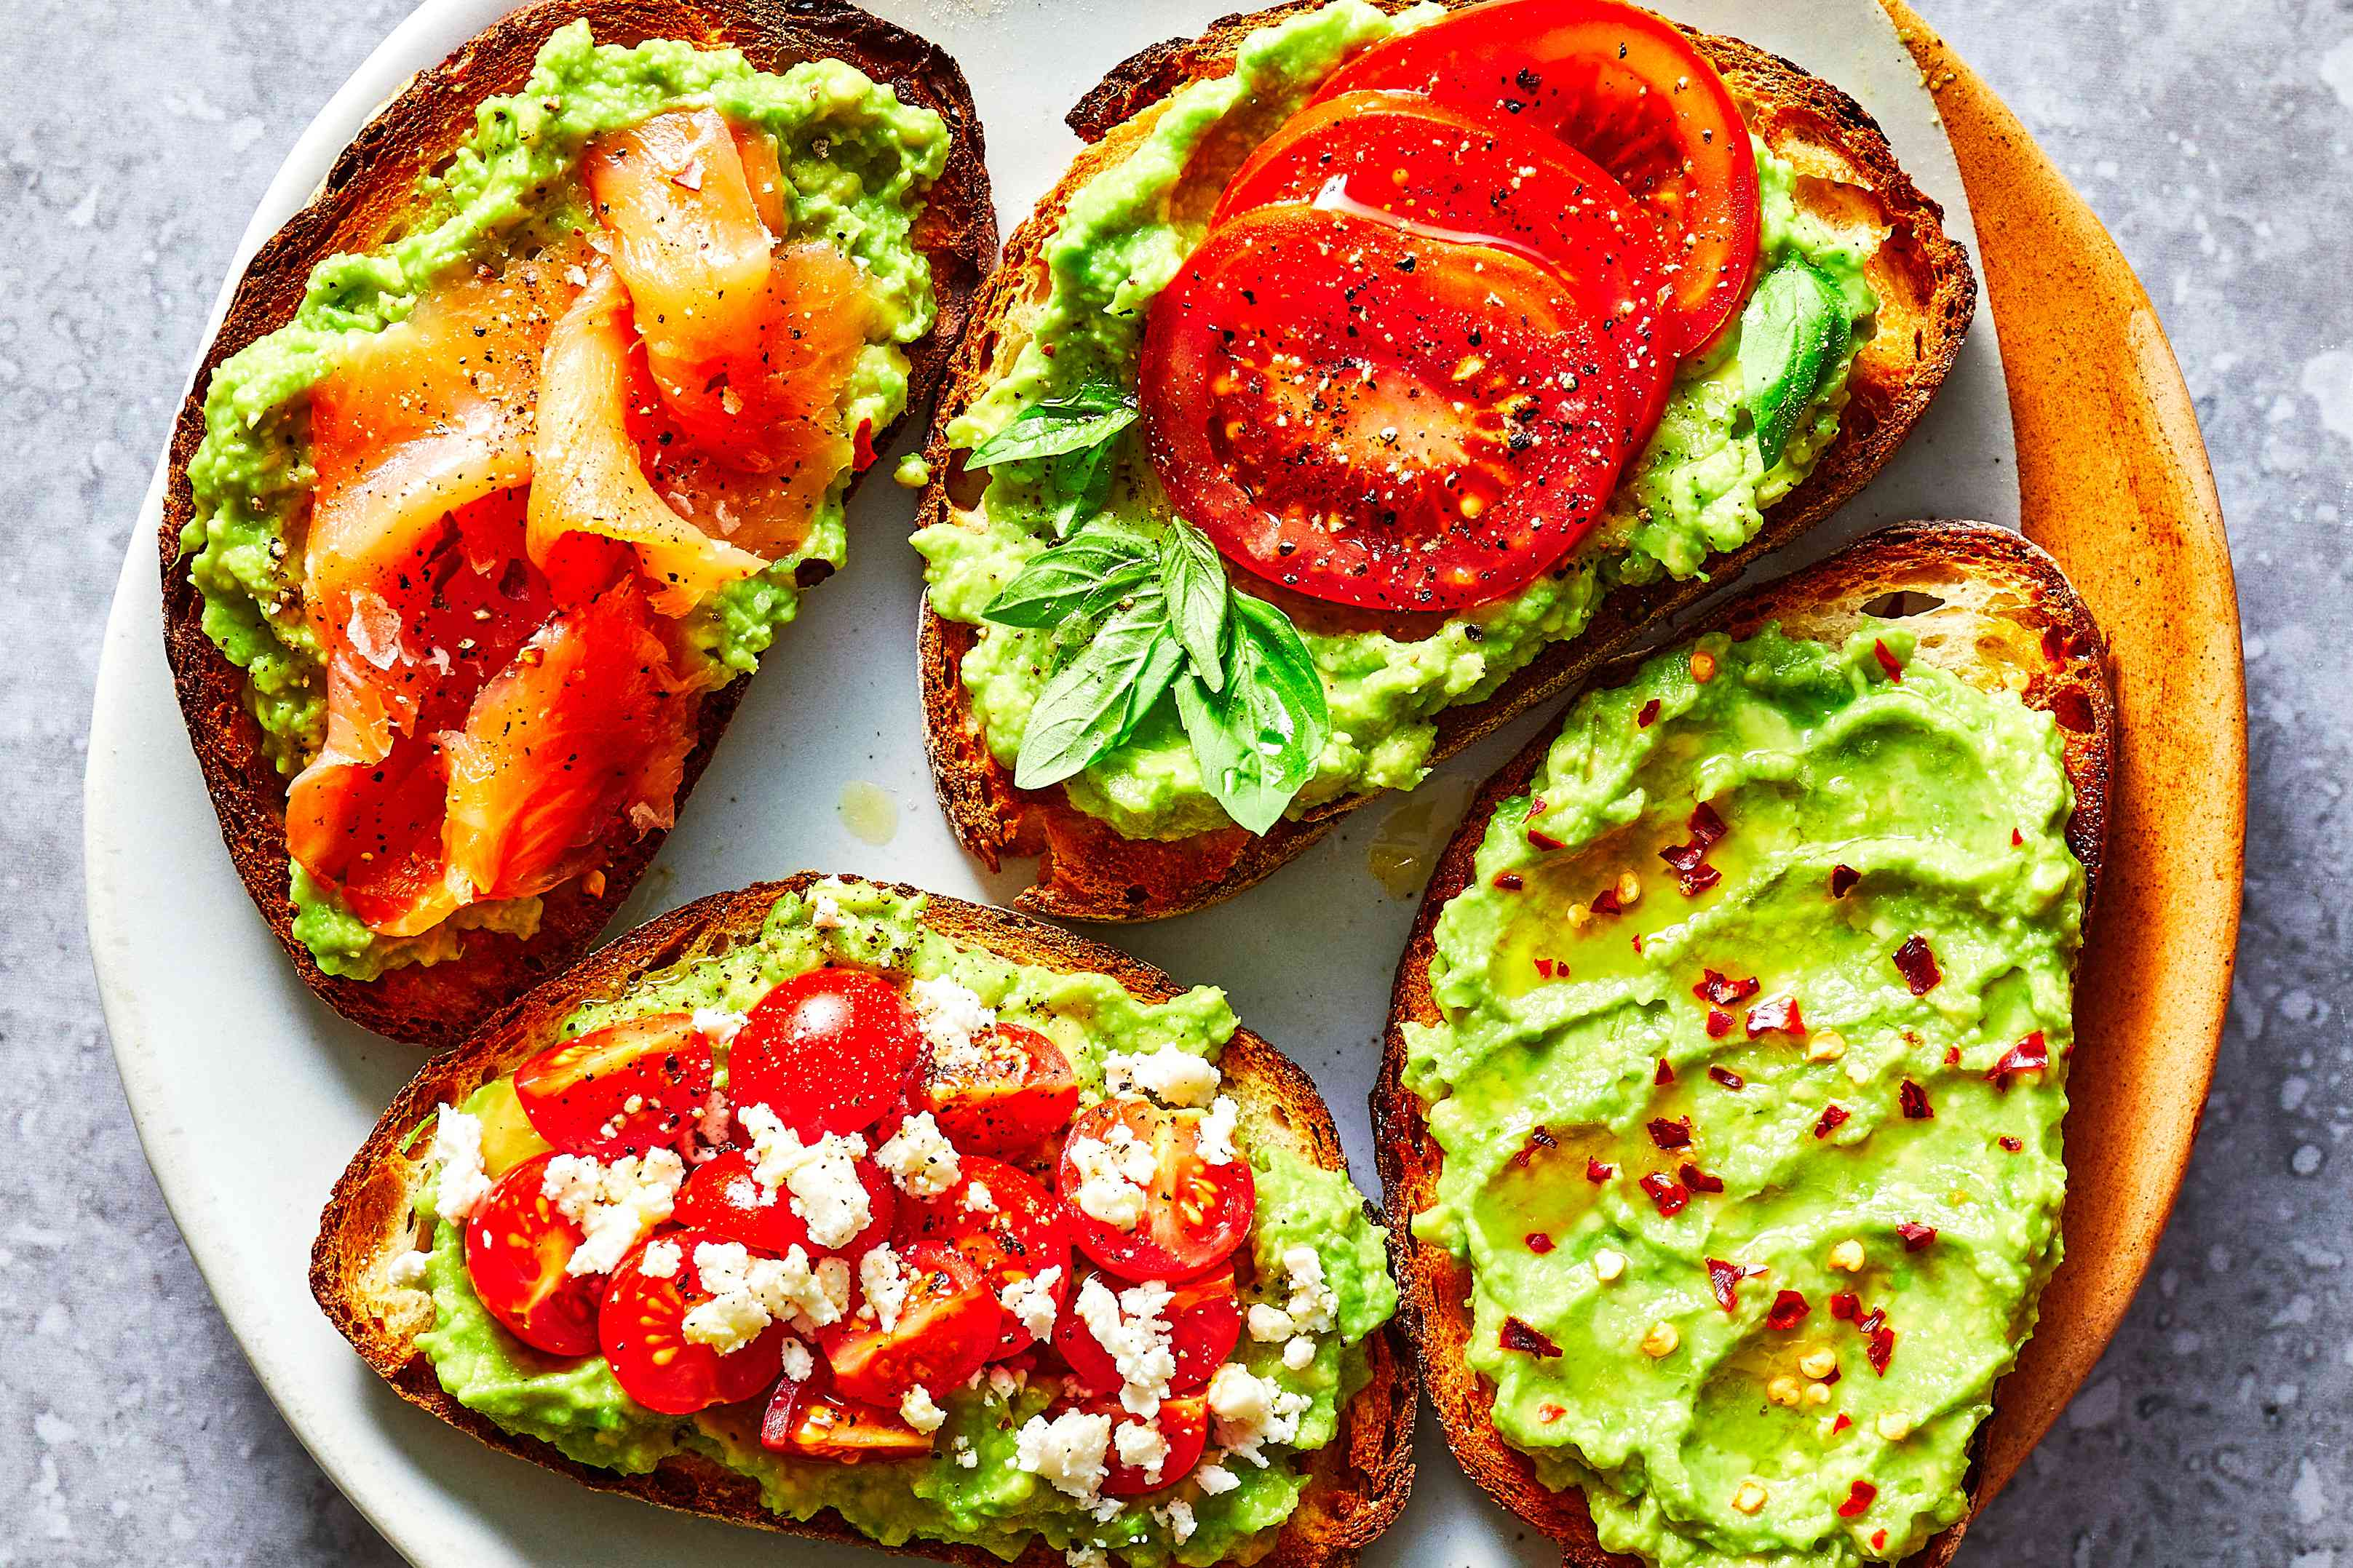 avocado toasts on a plate